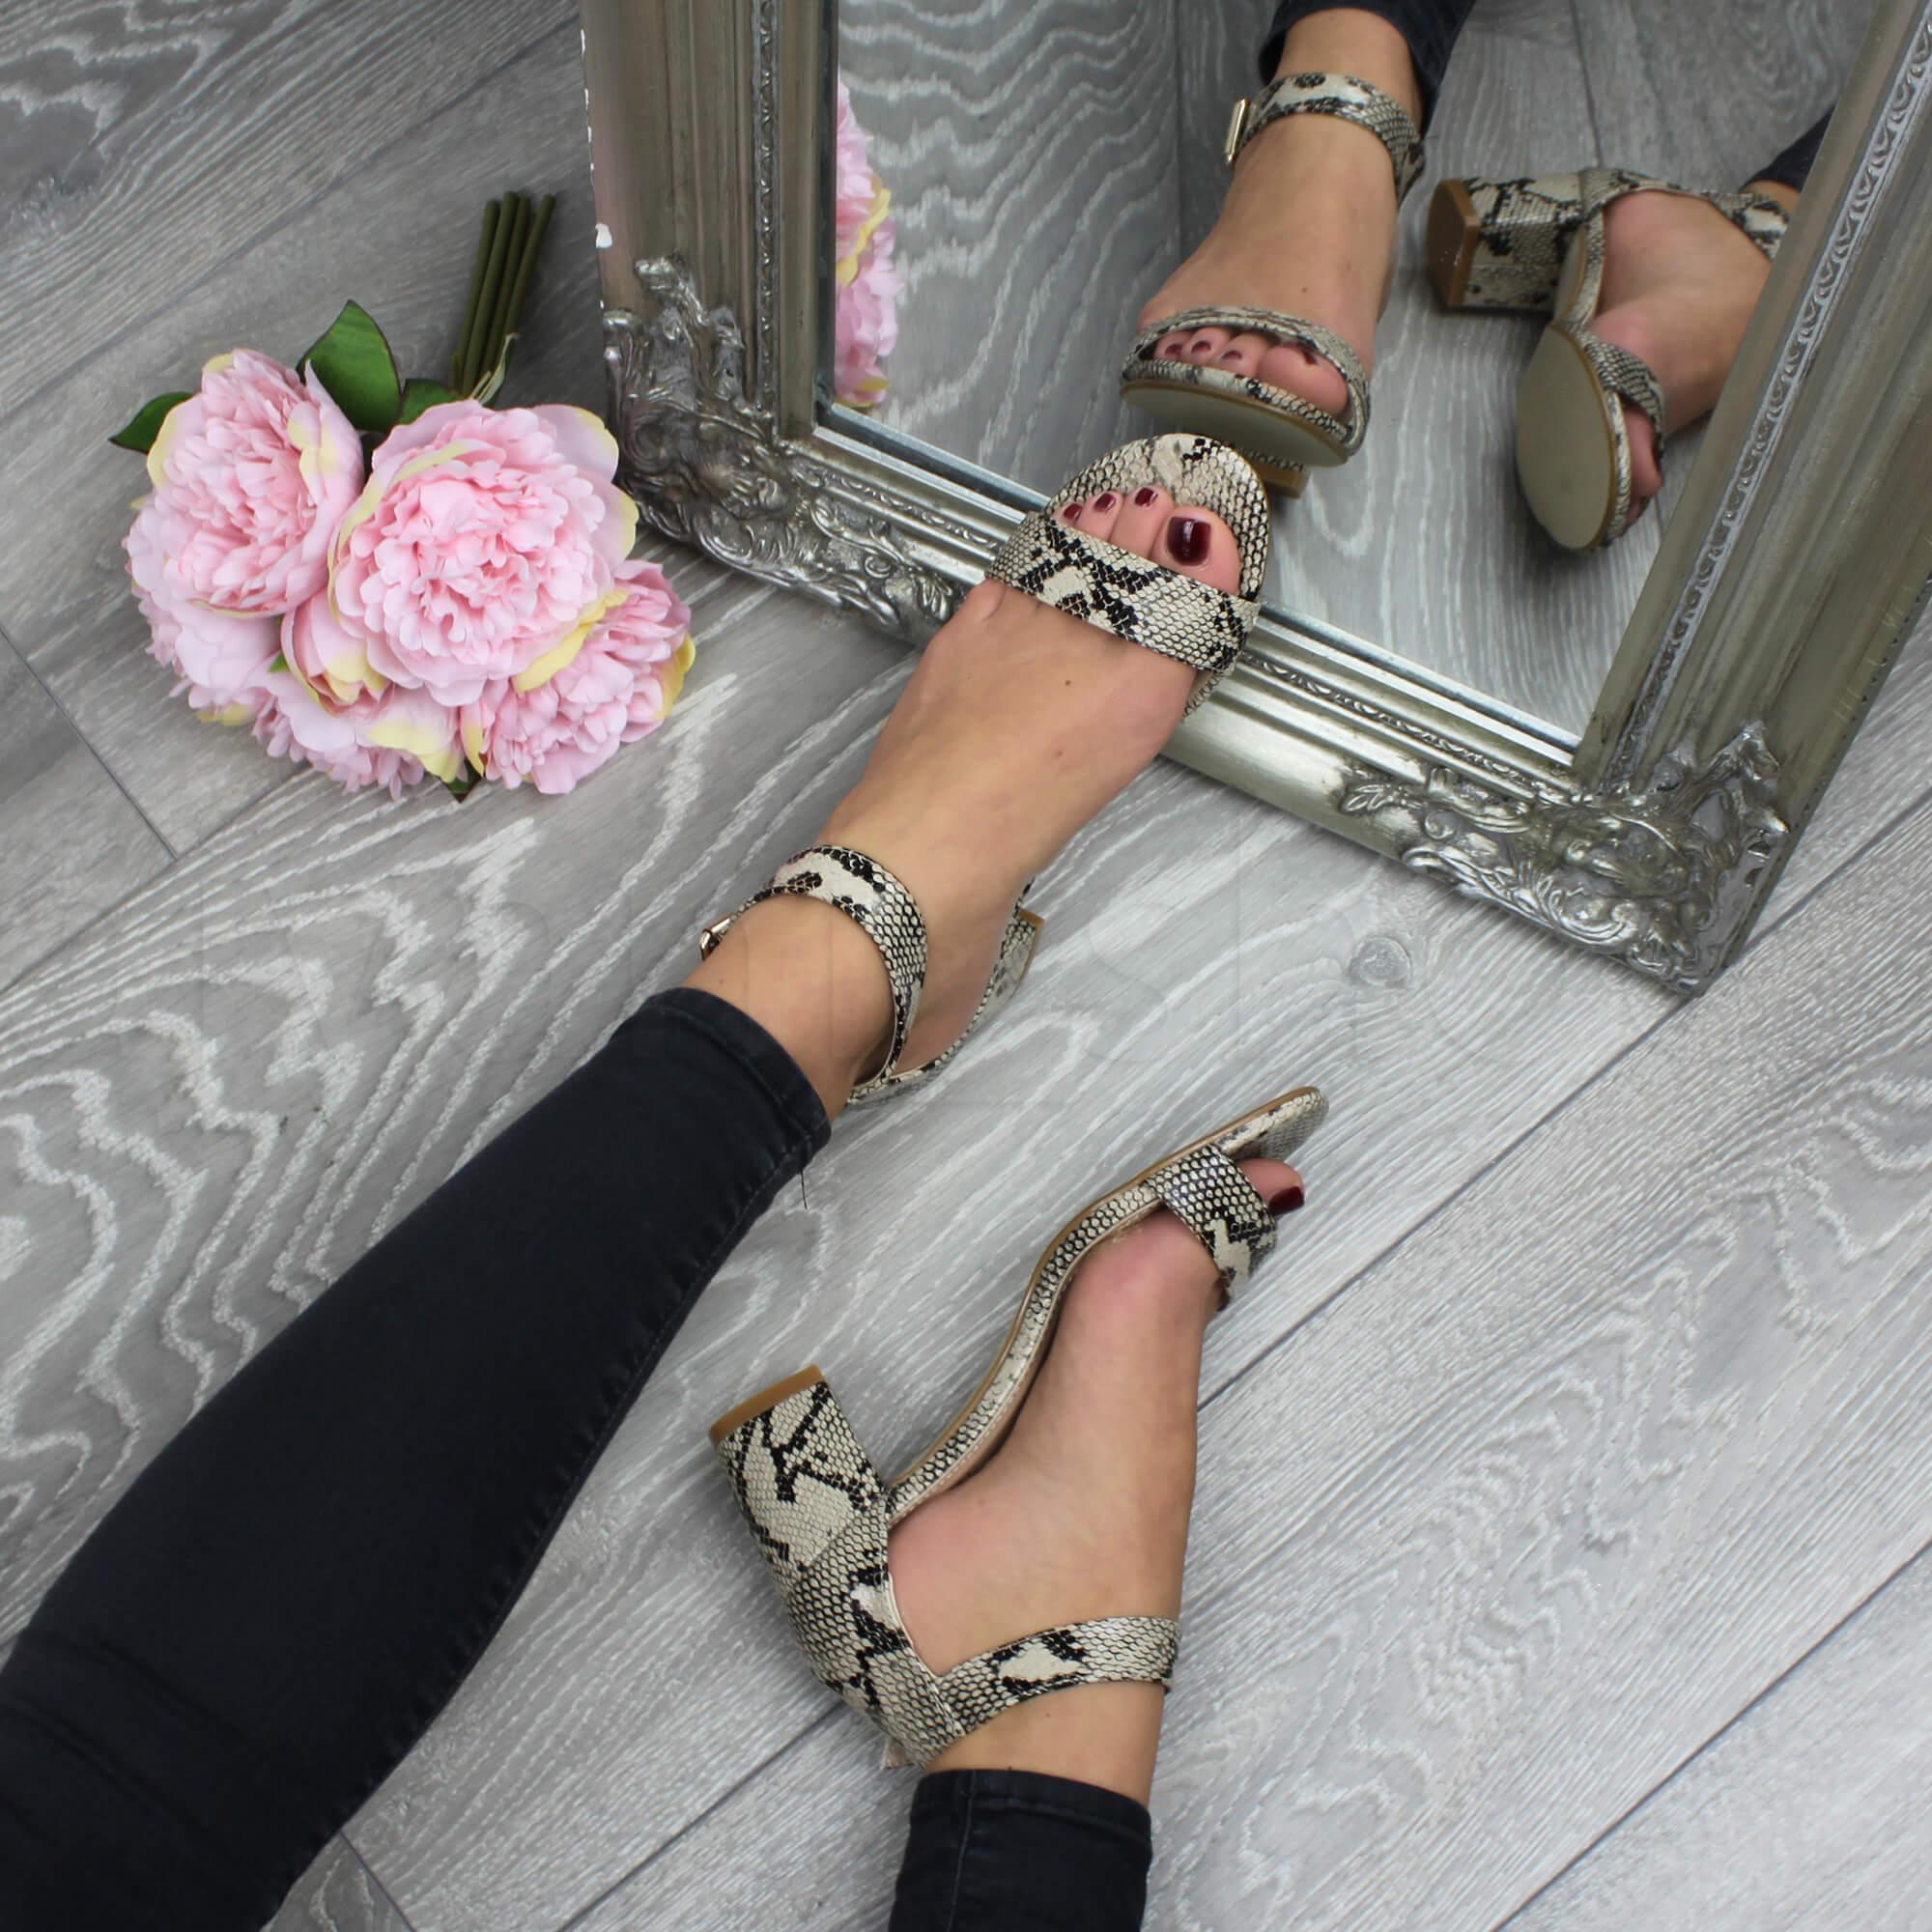 Donna-tacco-medio-fibbia-punta-aperta-caviglia-cinghietti-sandali-taglia miniatura 22